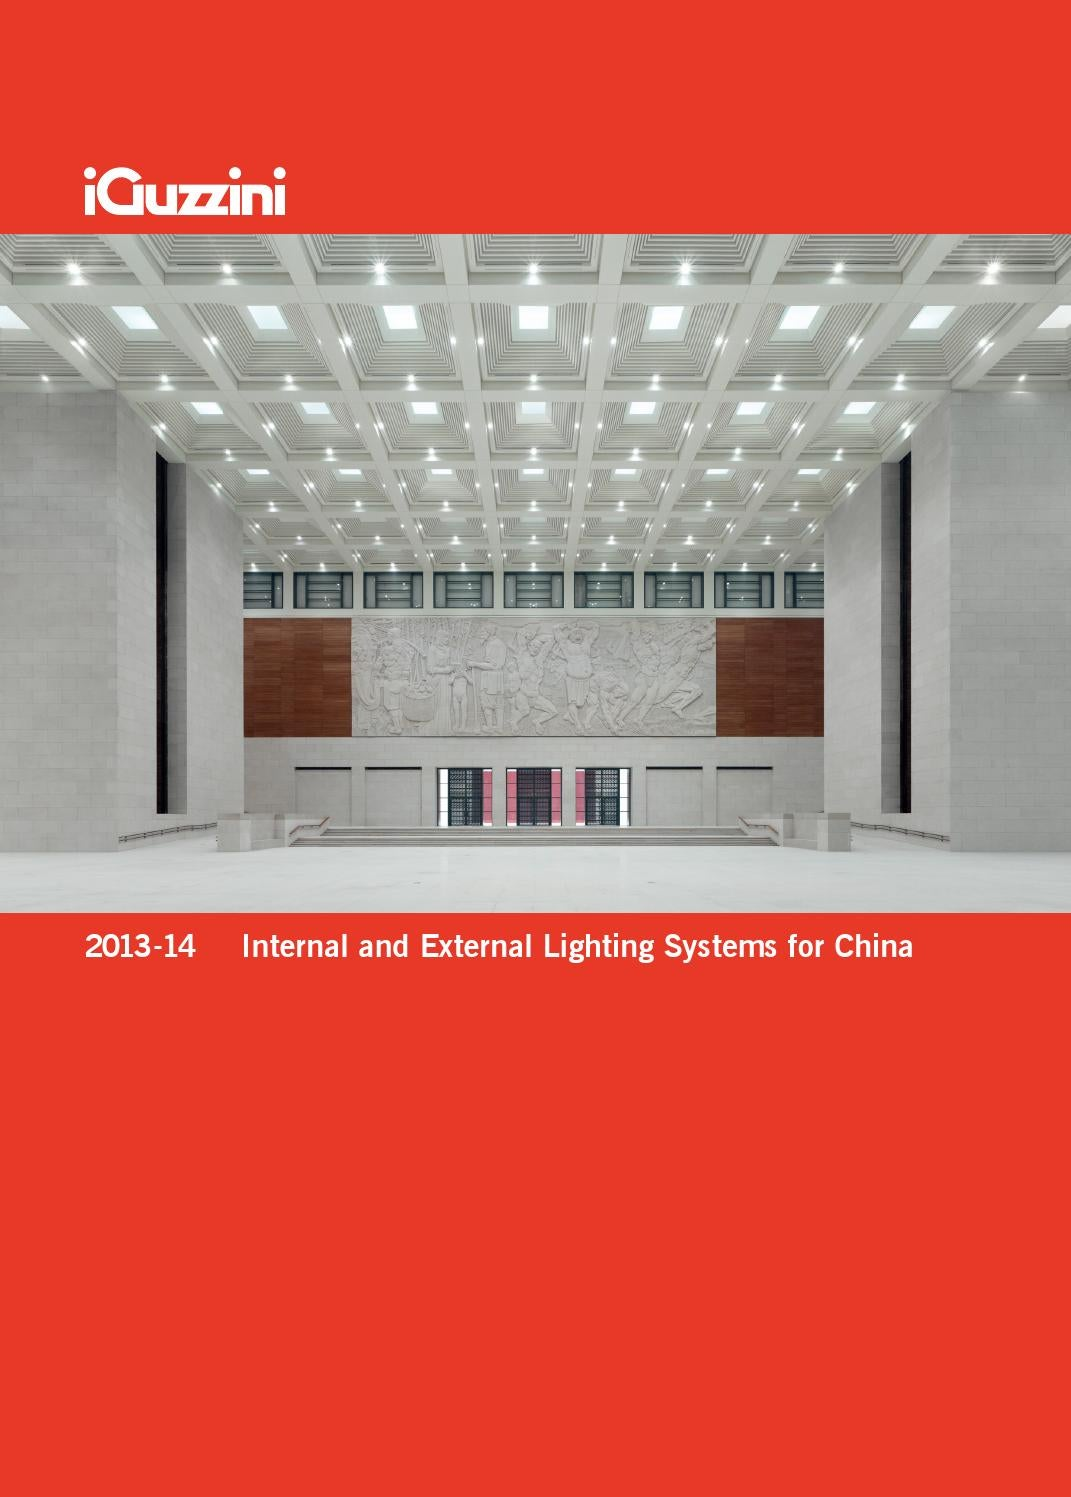 iguzzini 2013 2014 china part 1 by issuu. Black Bedroom Furniture Sets. Home Design Ideas